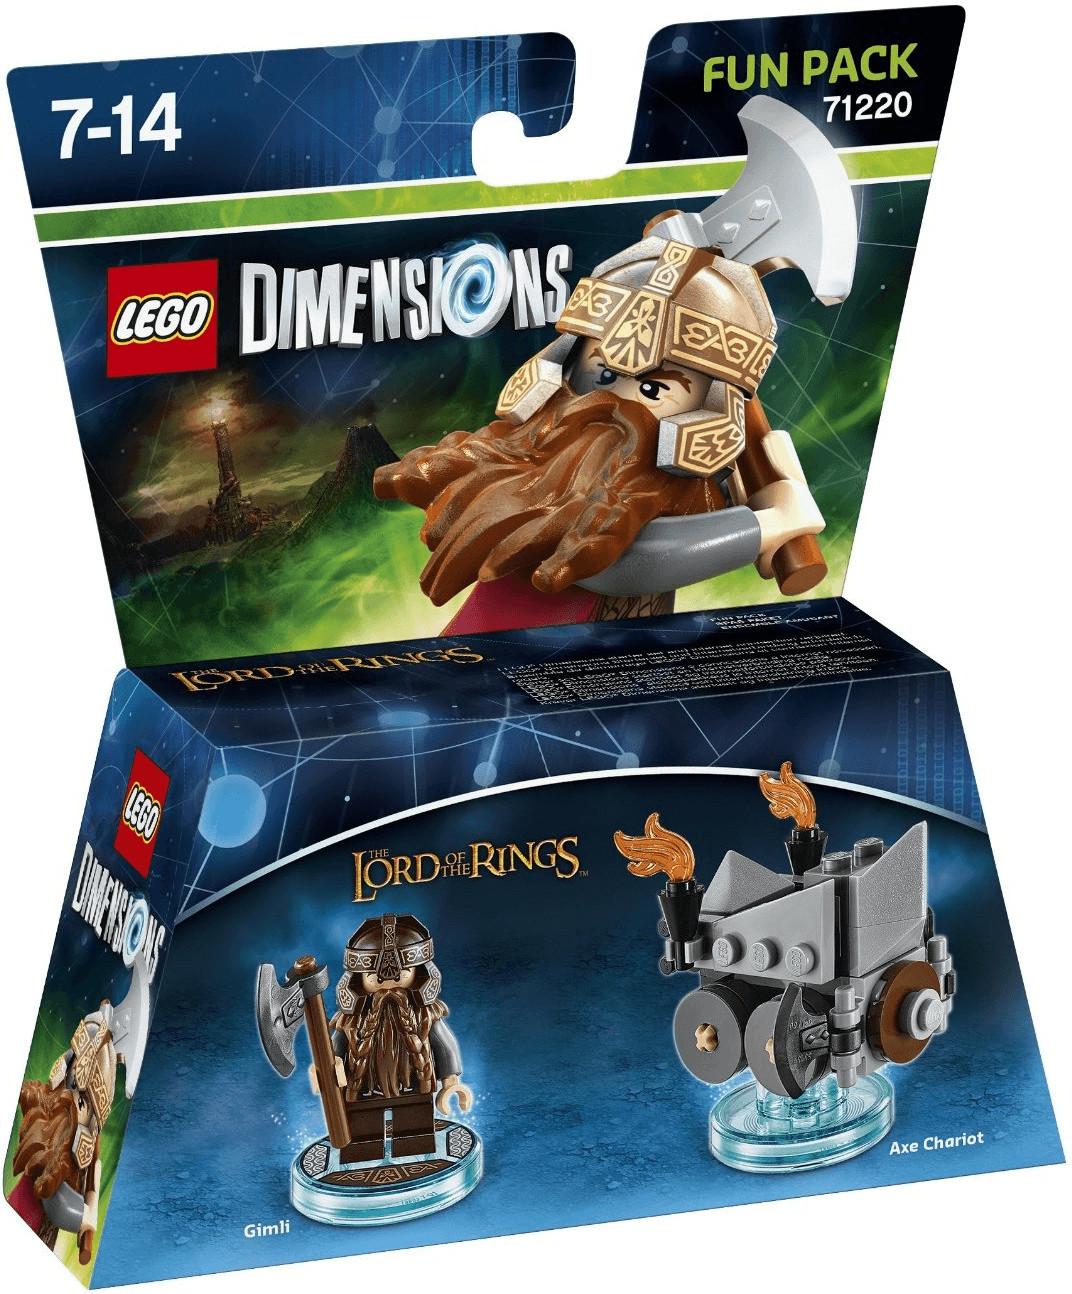 LEGO Dimensions: Spaß Pack - Gimli